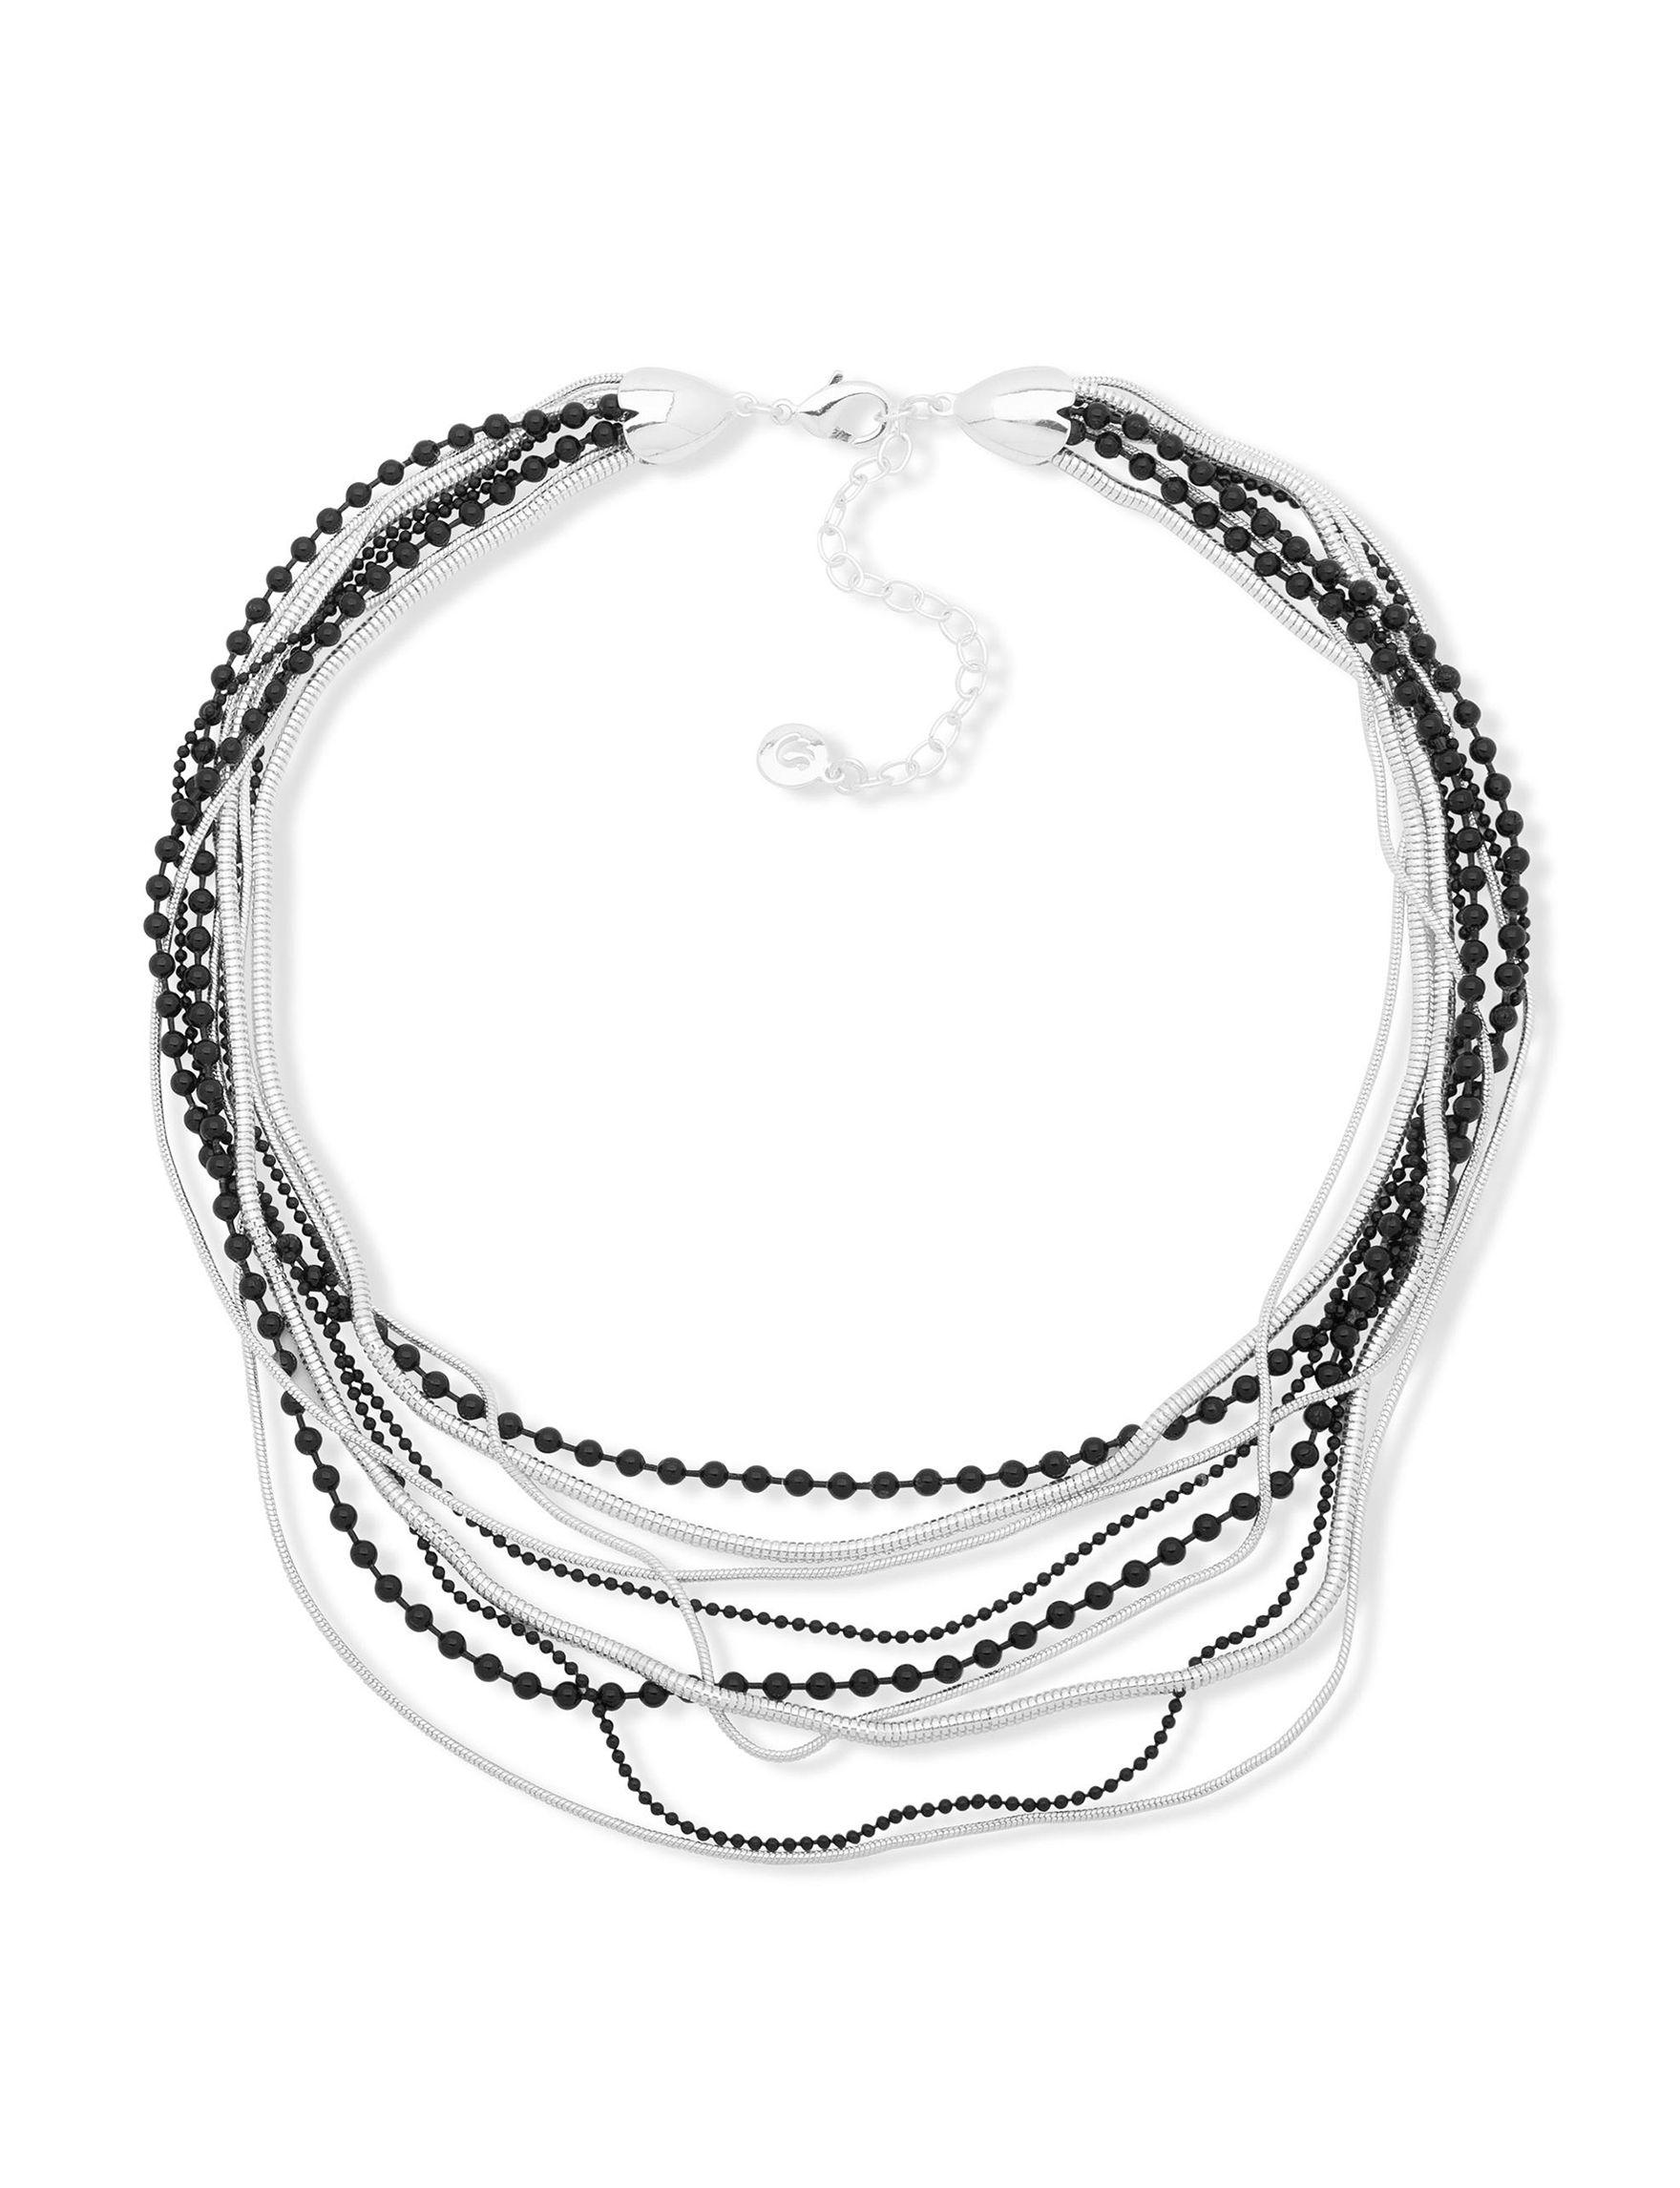 Gloria Vanderbilt Silver / Black Necklaces & Pendants Fashion Jewelry